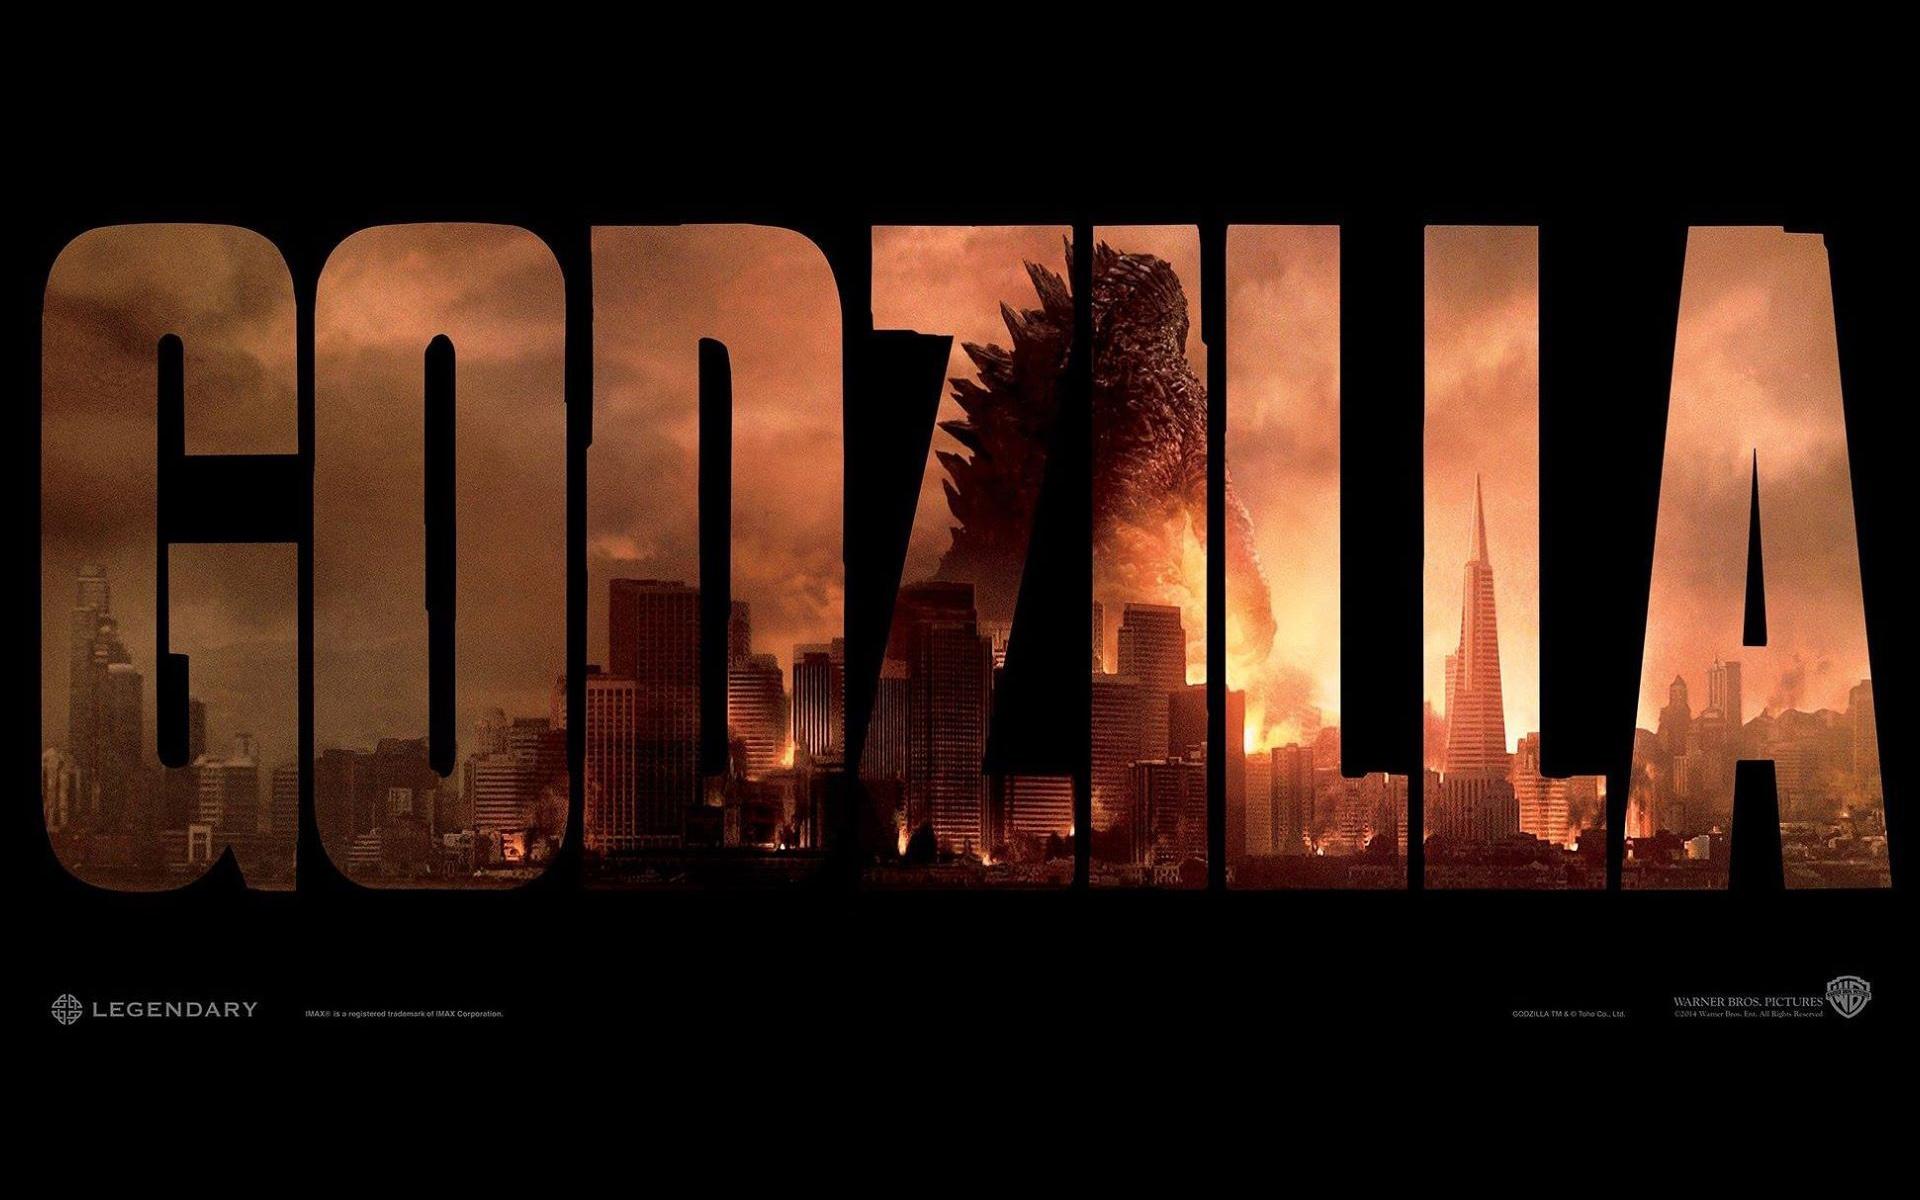 Godzilla Movie Wallpapers HD Wallpapers 1920x1200